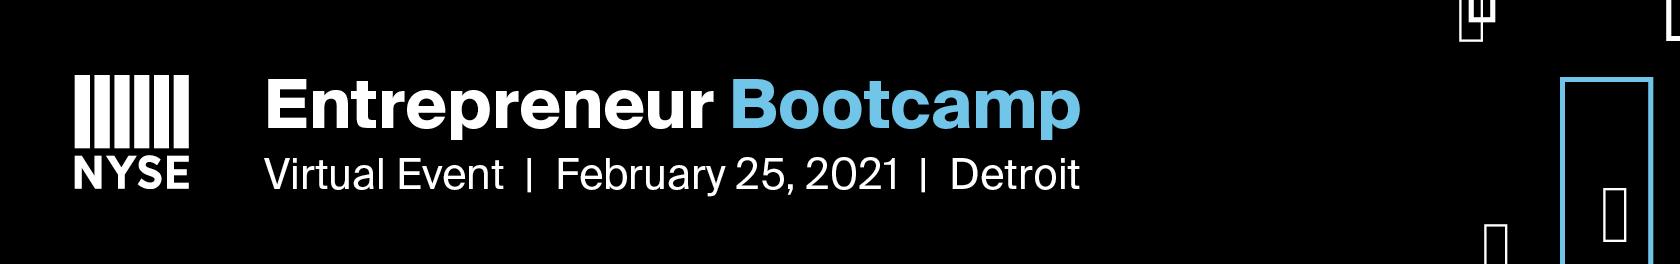 NYSE Entrepreneur Bootcamp Detroit